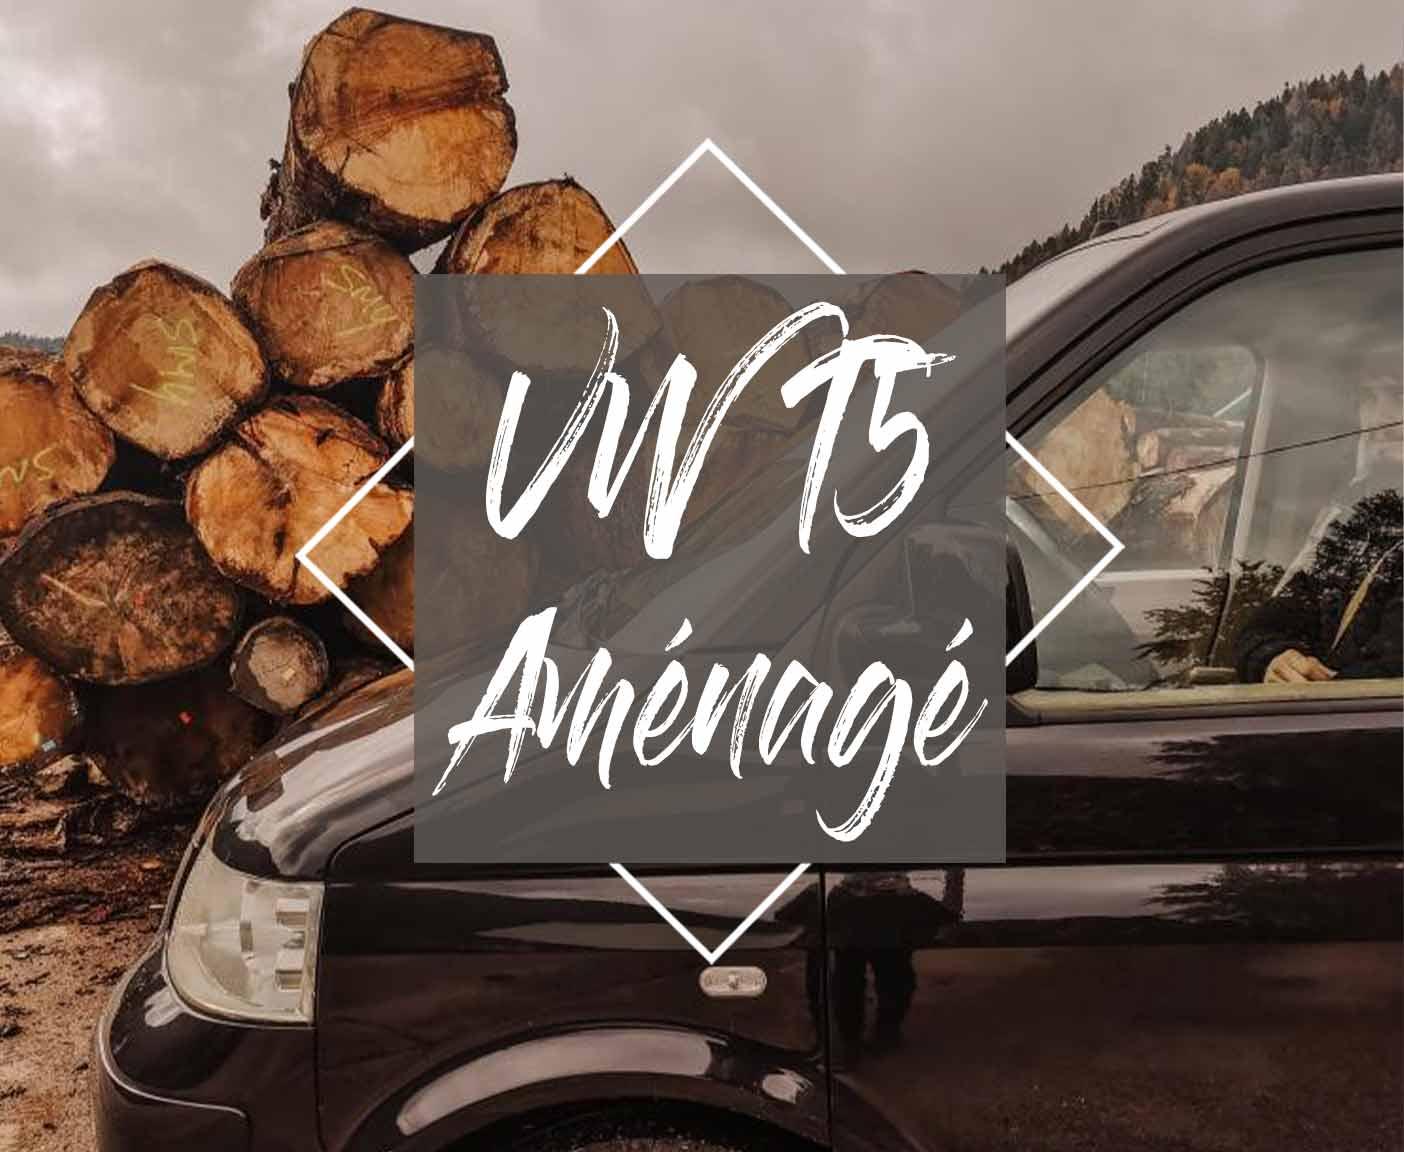 vw-t5-transporter-westfalia-california-van-fourgon-amenage-vanlife-roadtrip-europe